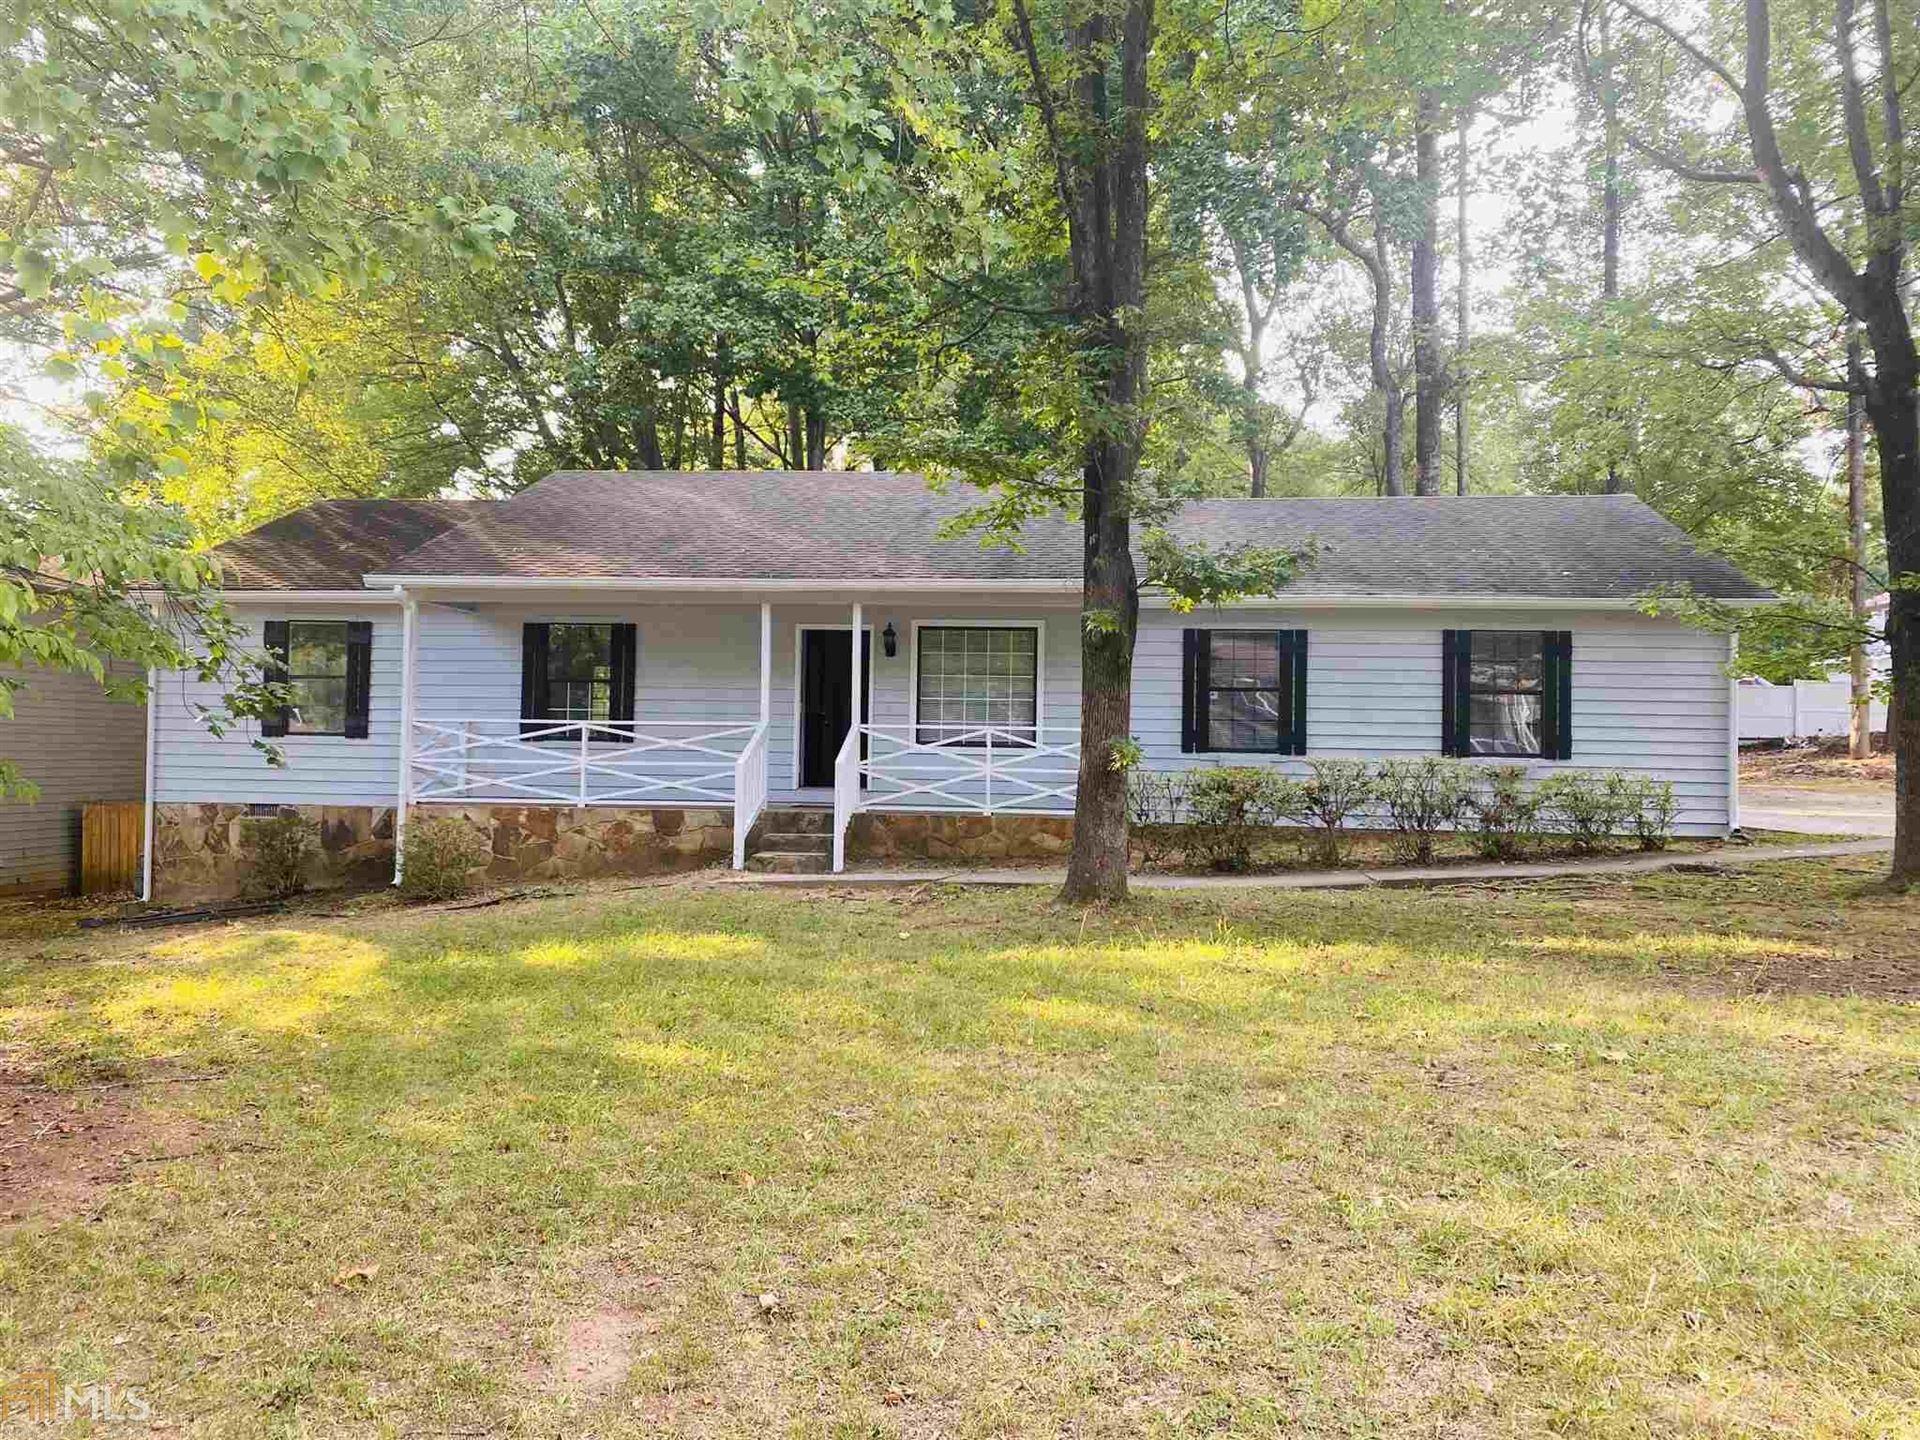 864 Terrace Trce, Lawrenceville, GA 30044 - MLS#: 8823452